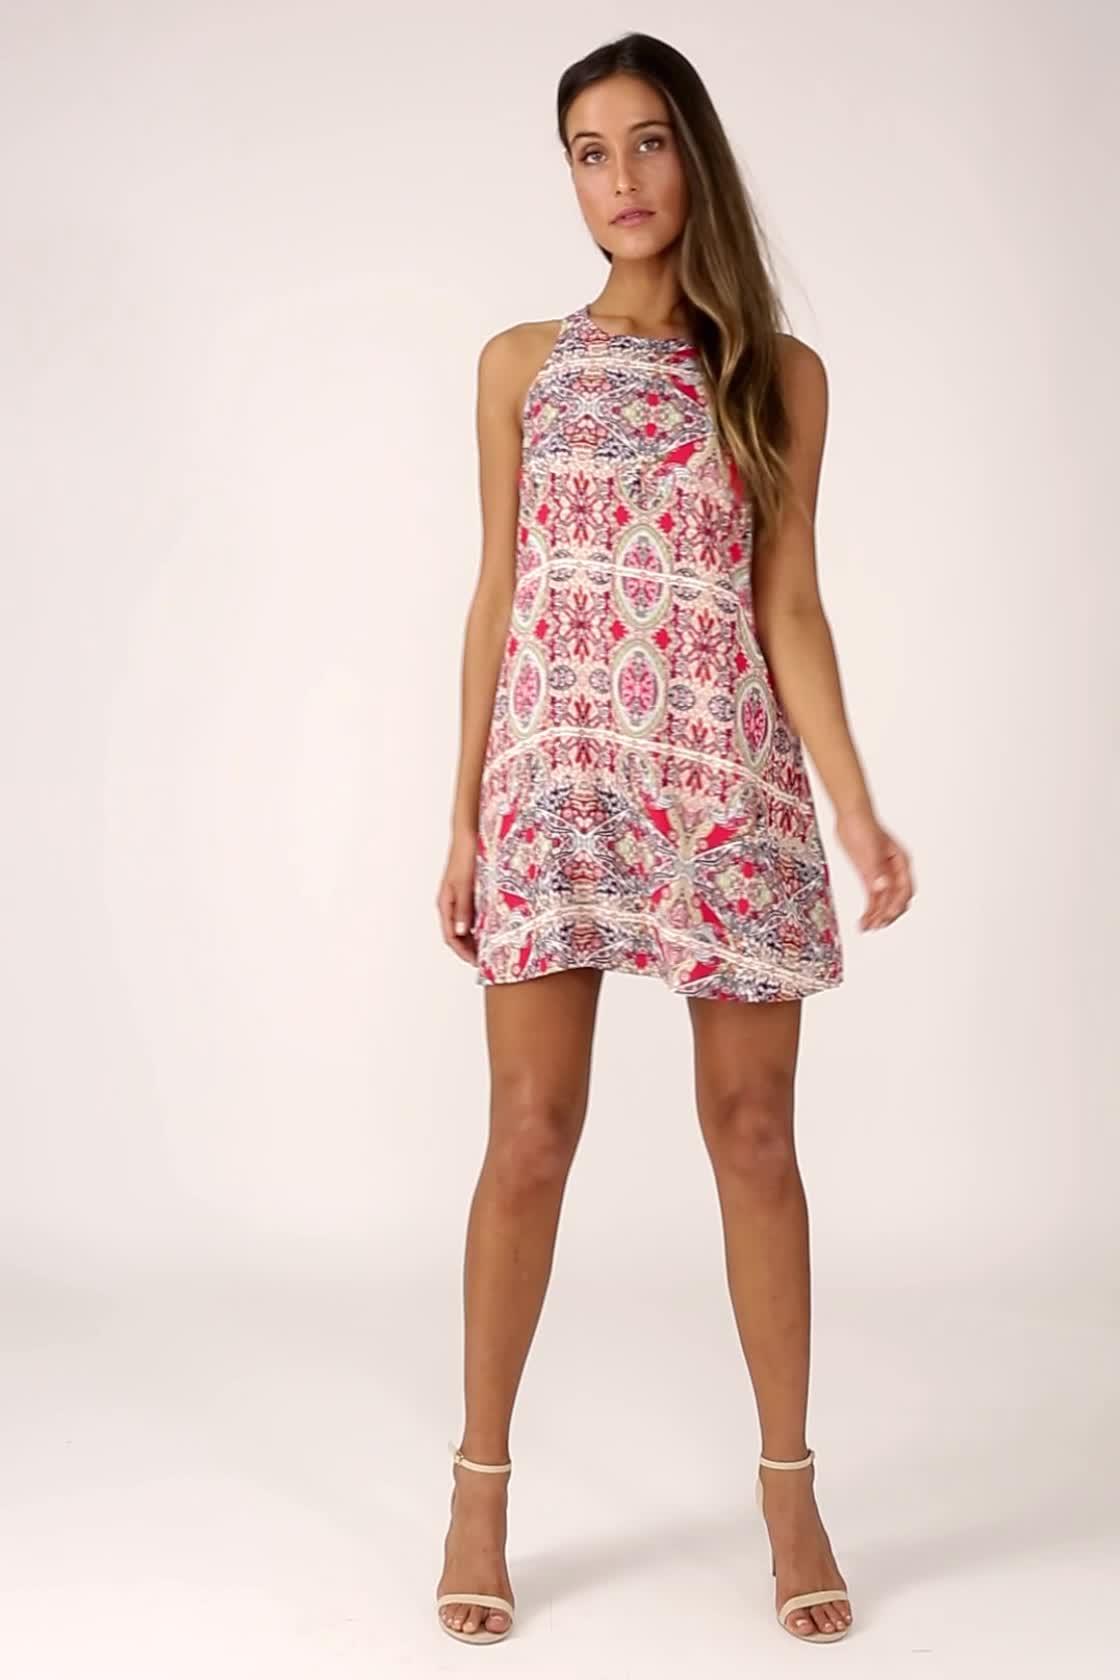 5f78990a562 Lovely Red Print Dress - Swing Dress - Sleeveless Dress - $39.00